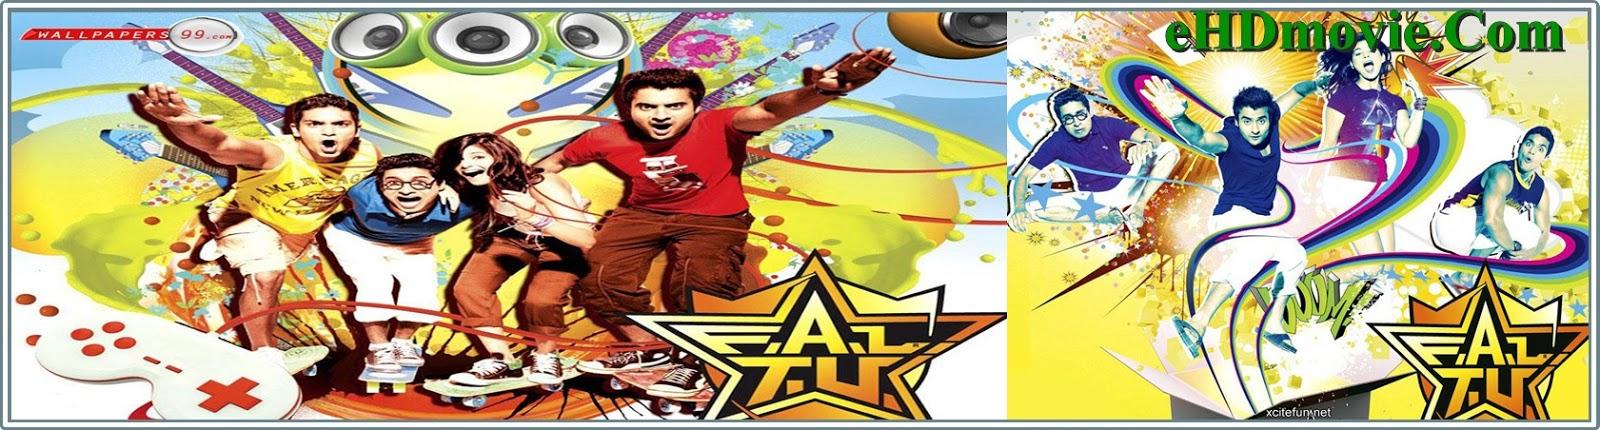 F.A.L.T.U 2011 Full Movie Hindi 720p - 480p ORG BRRip 350MB - 900MB ESubs Free Download